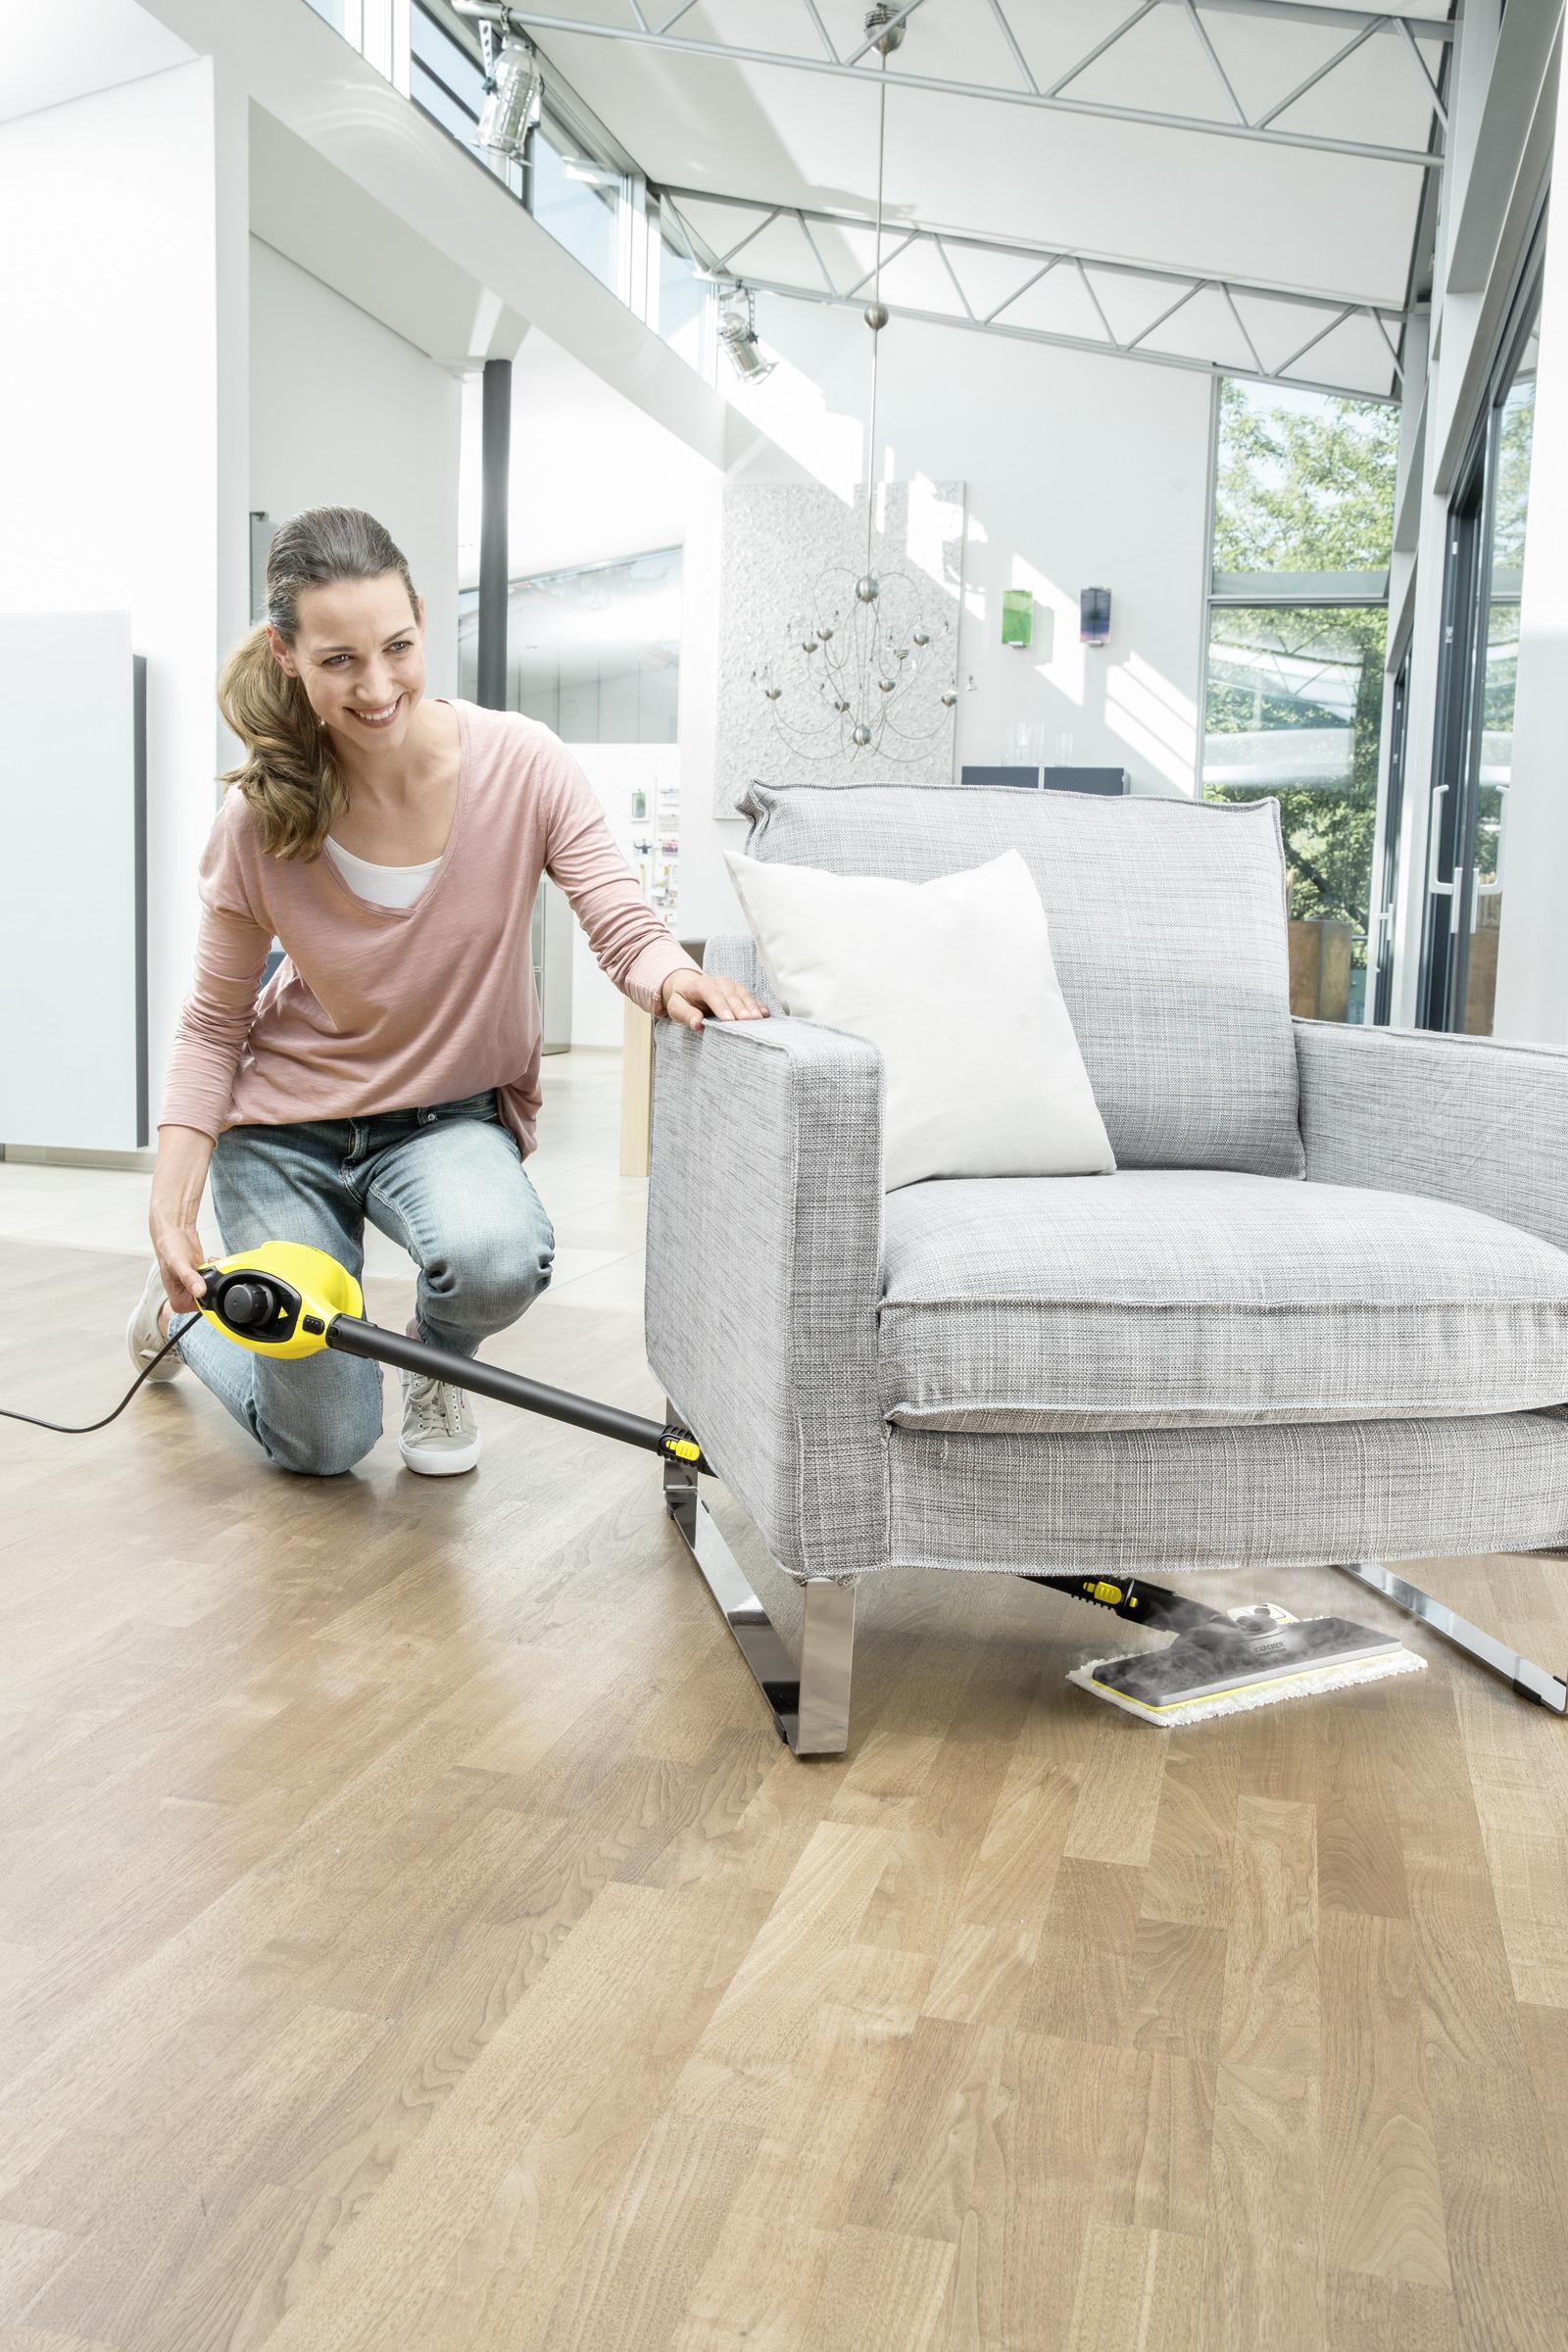 dampfreiniger sc 1 easyfix k rcher. Black Bedroom Furniture Sets. Home Design Ideas